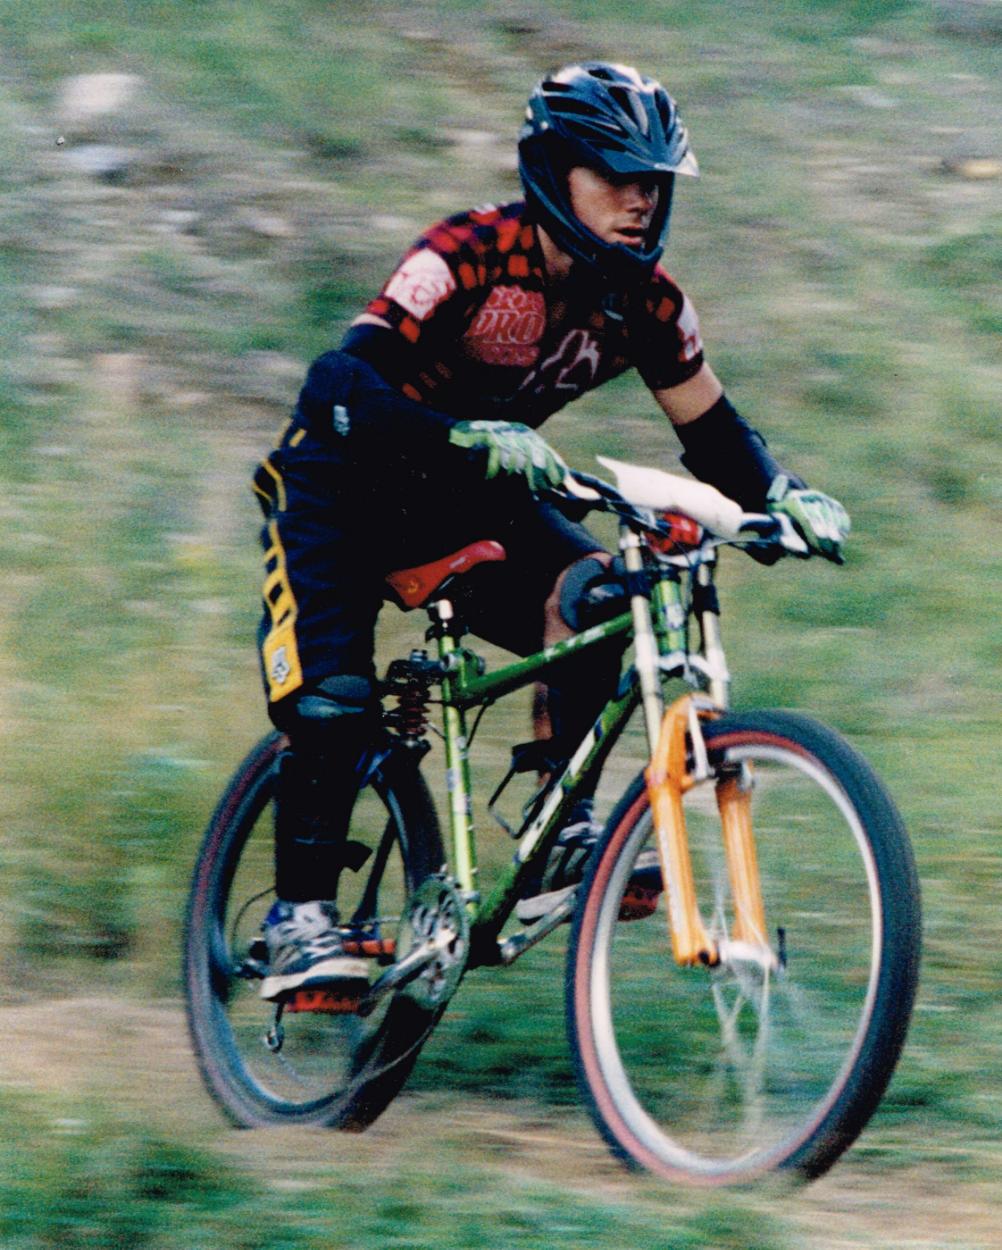 '98 @ Attitash Bear Peak, New Hampshire